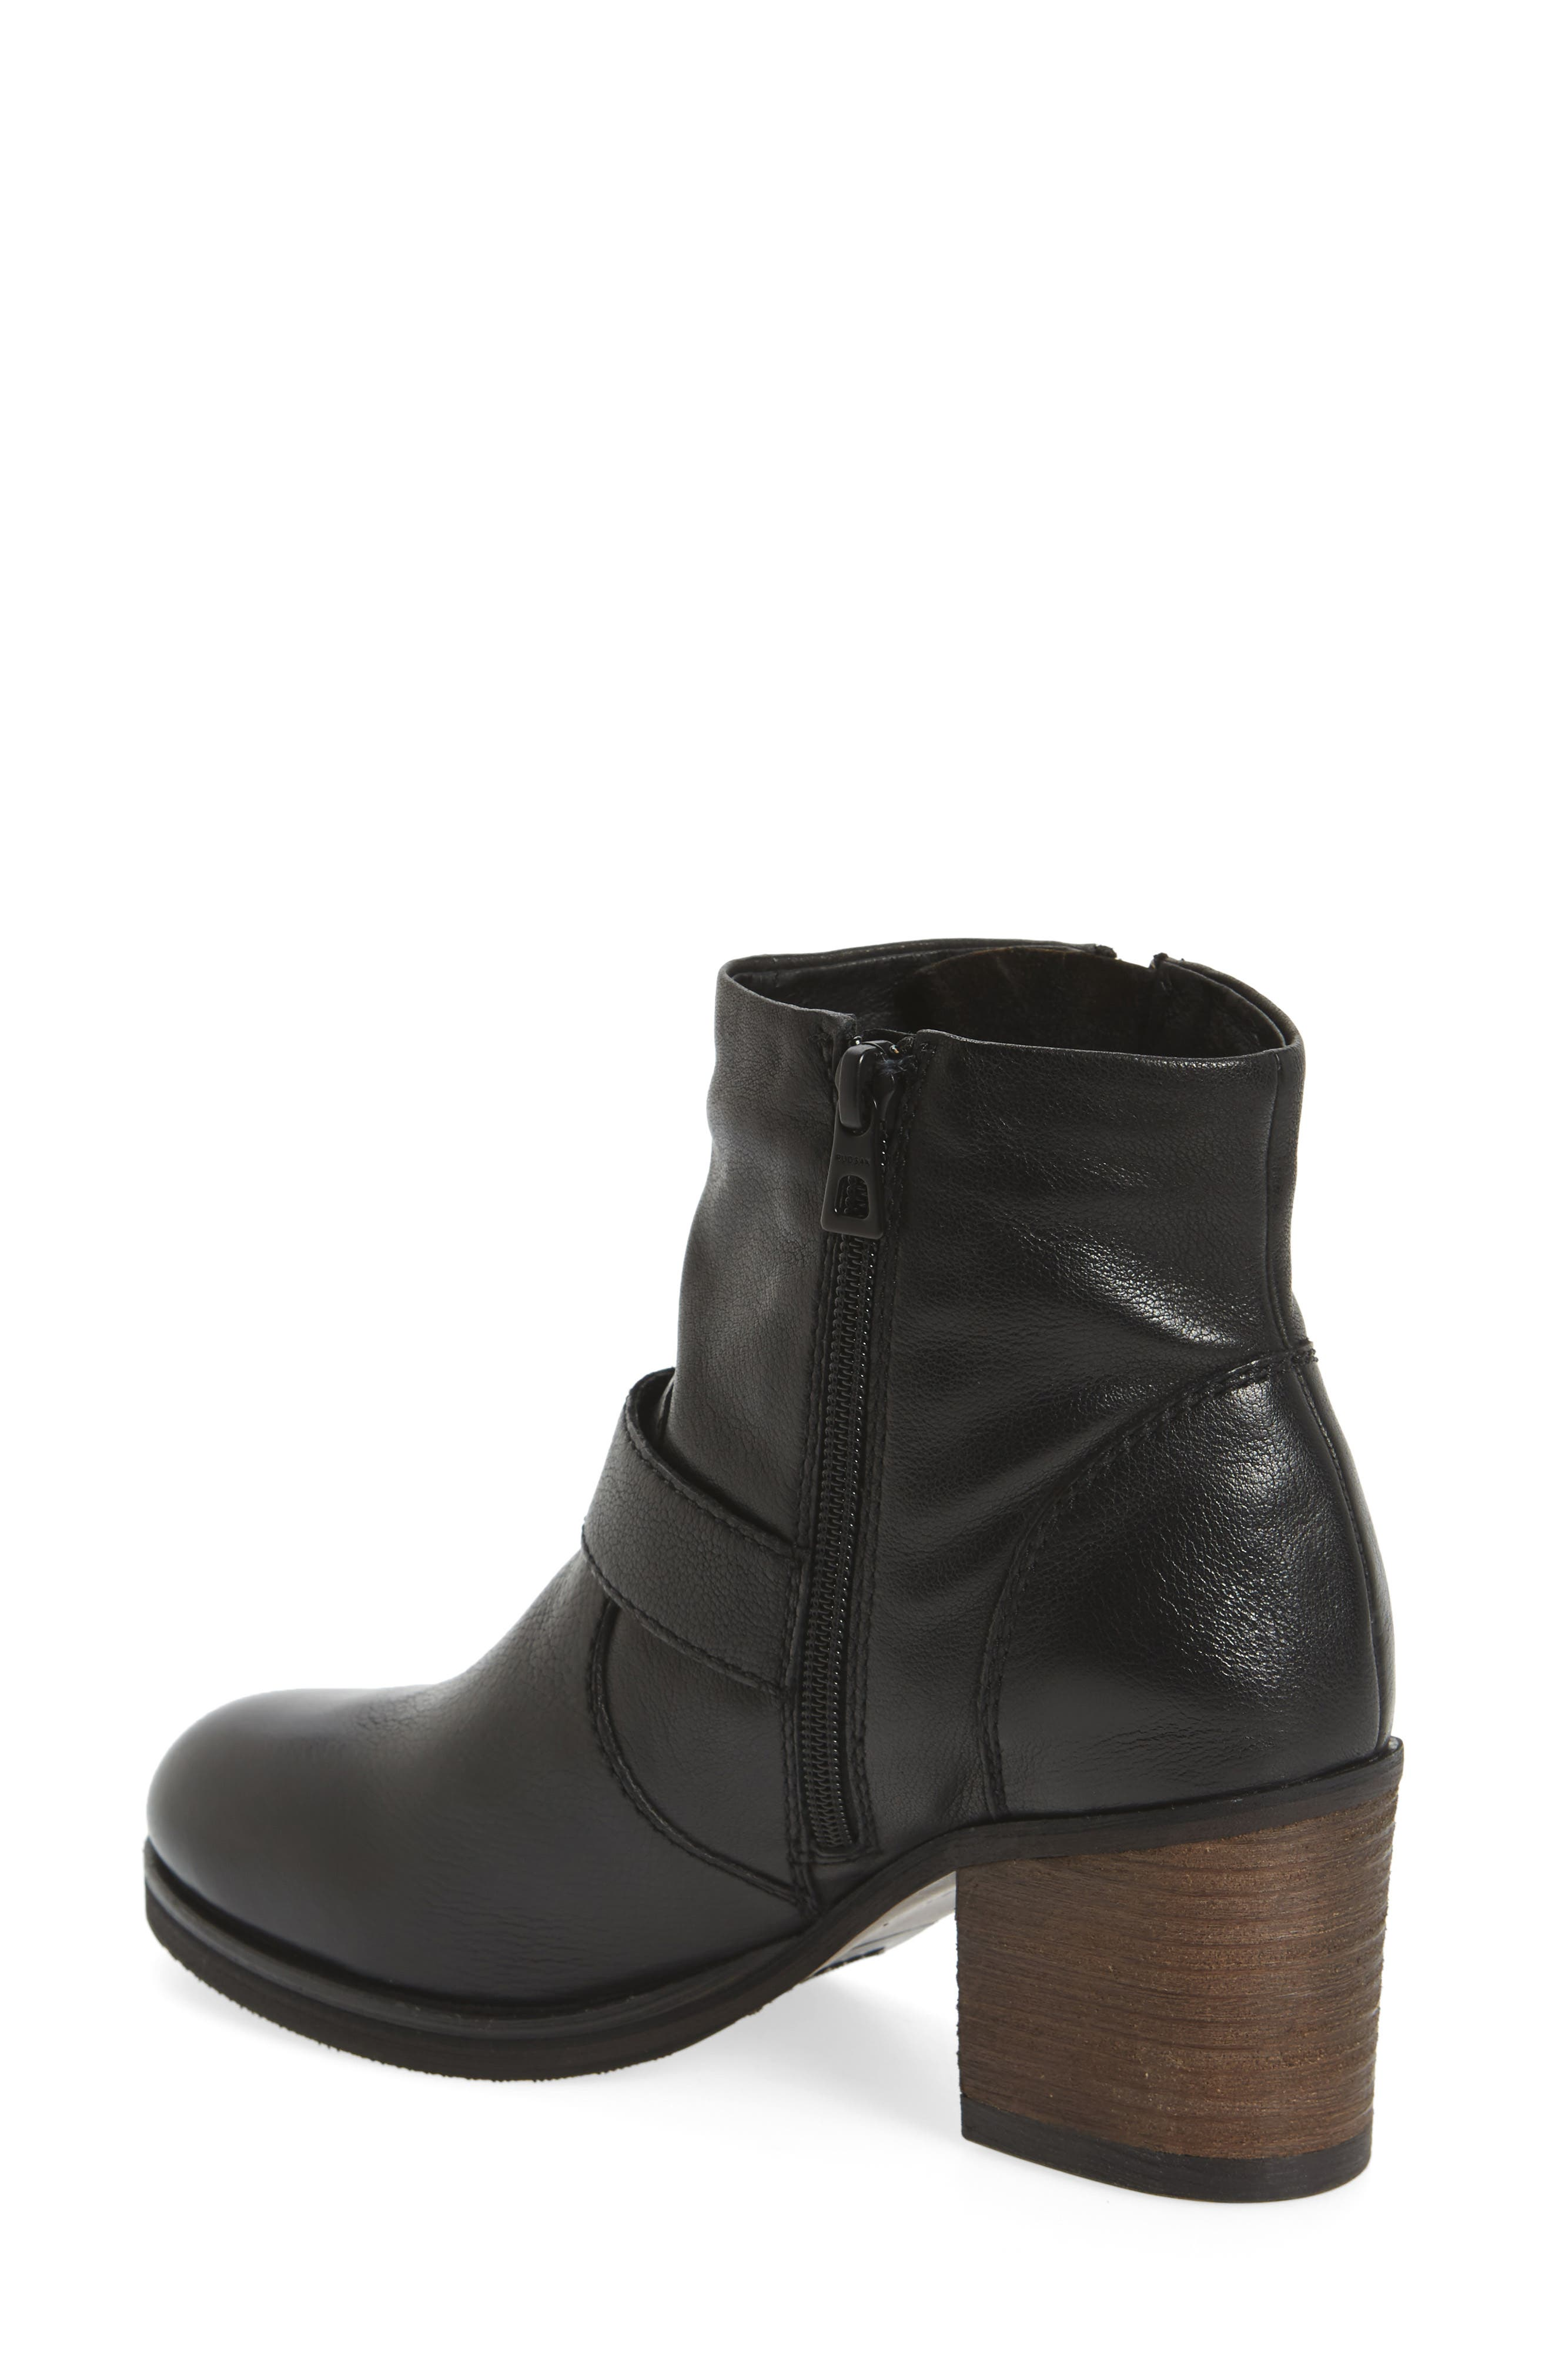 Balady Boot,                             Alternate thumbnail 2, color,                             Black/ Black Leather